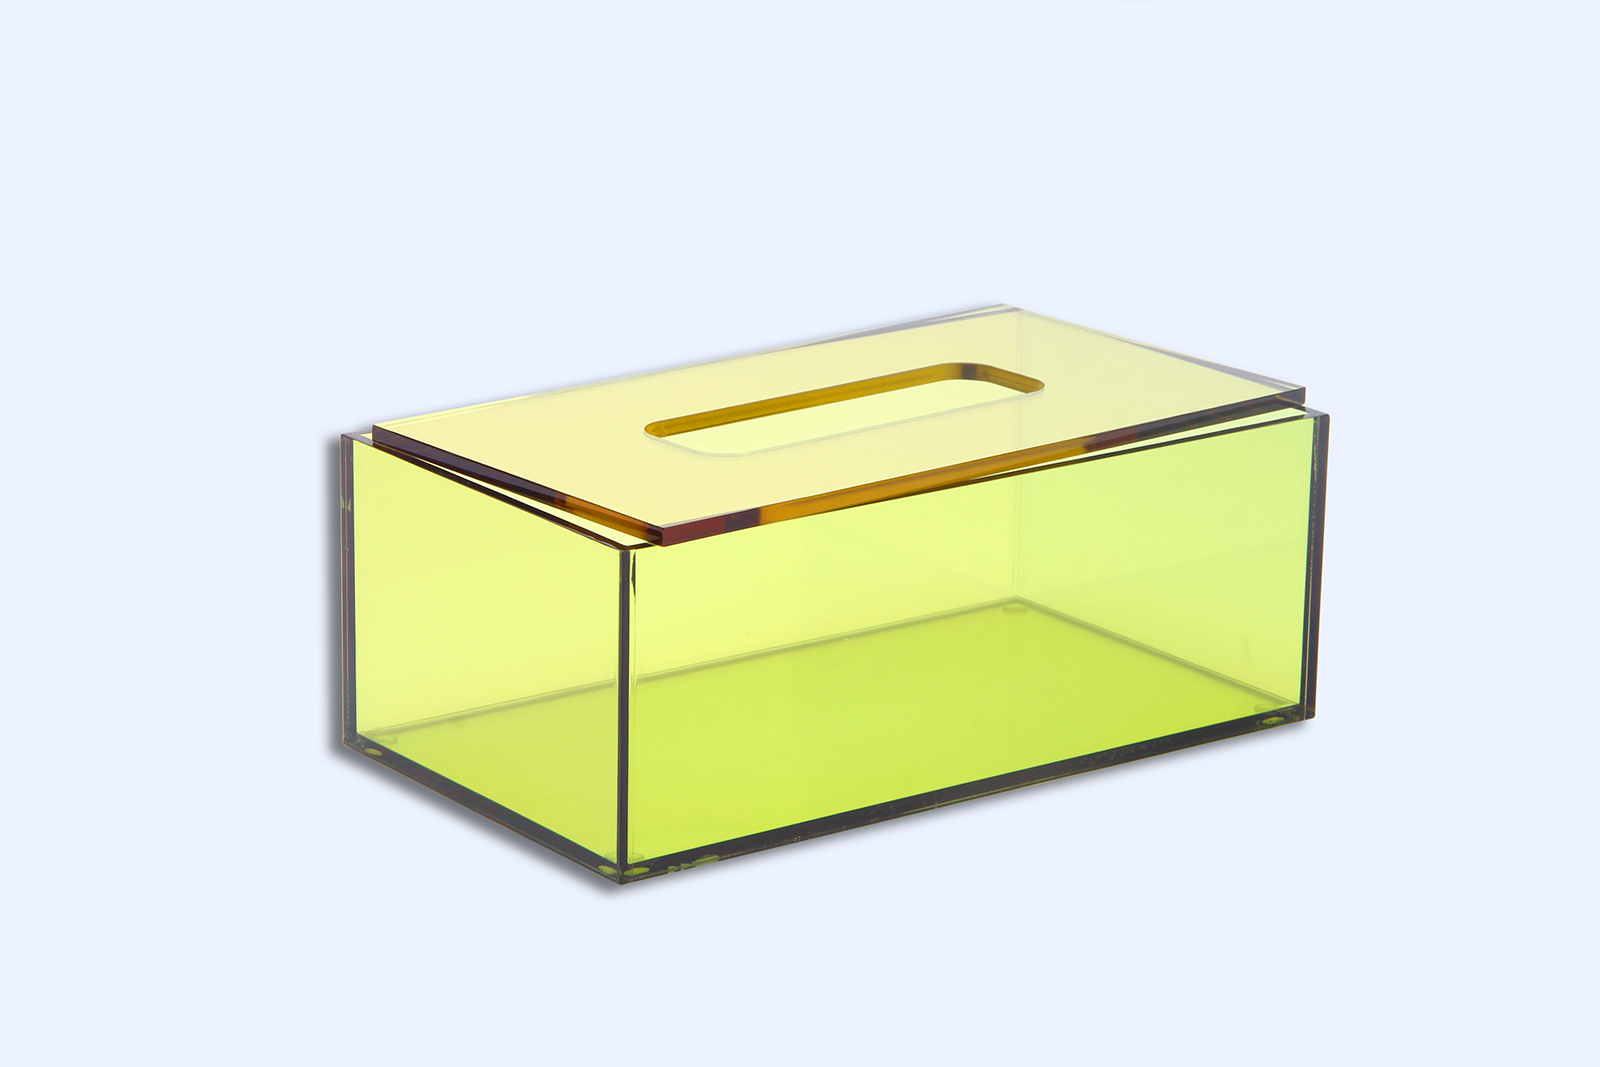 Square pumping box